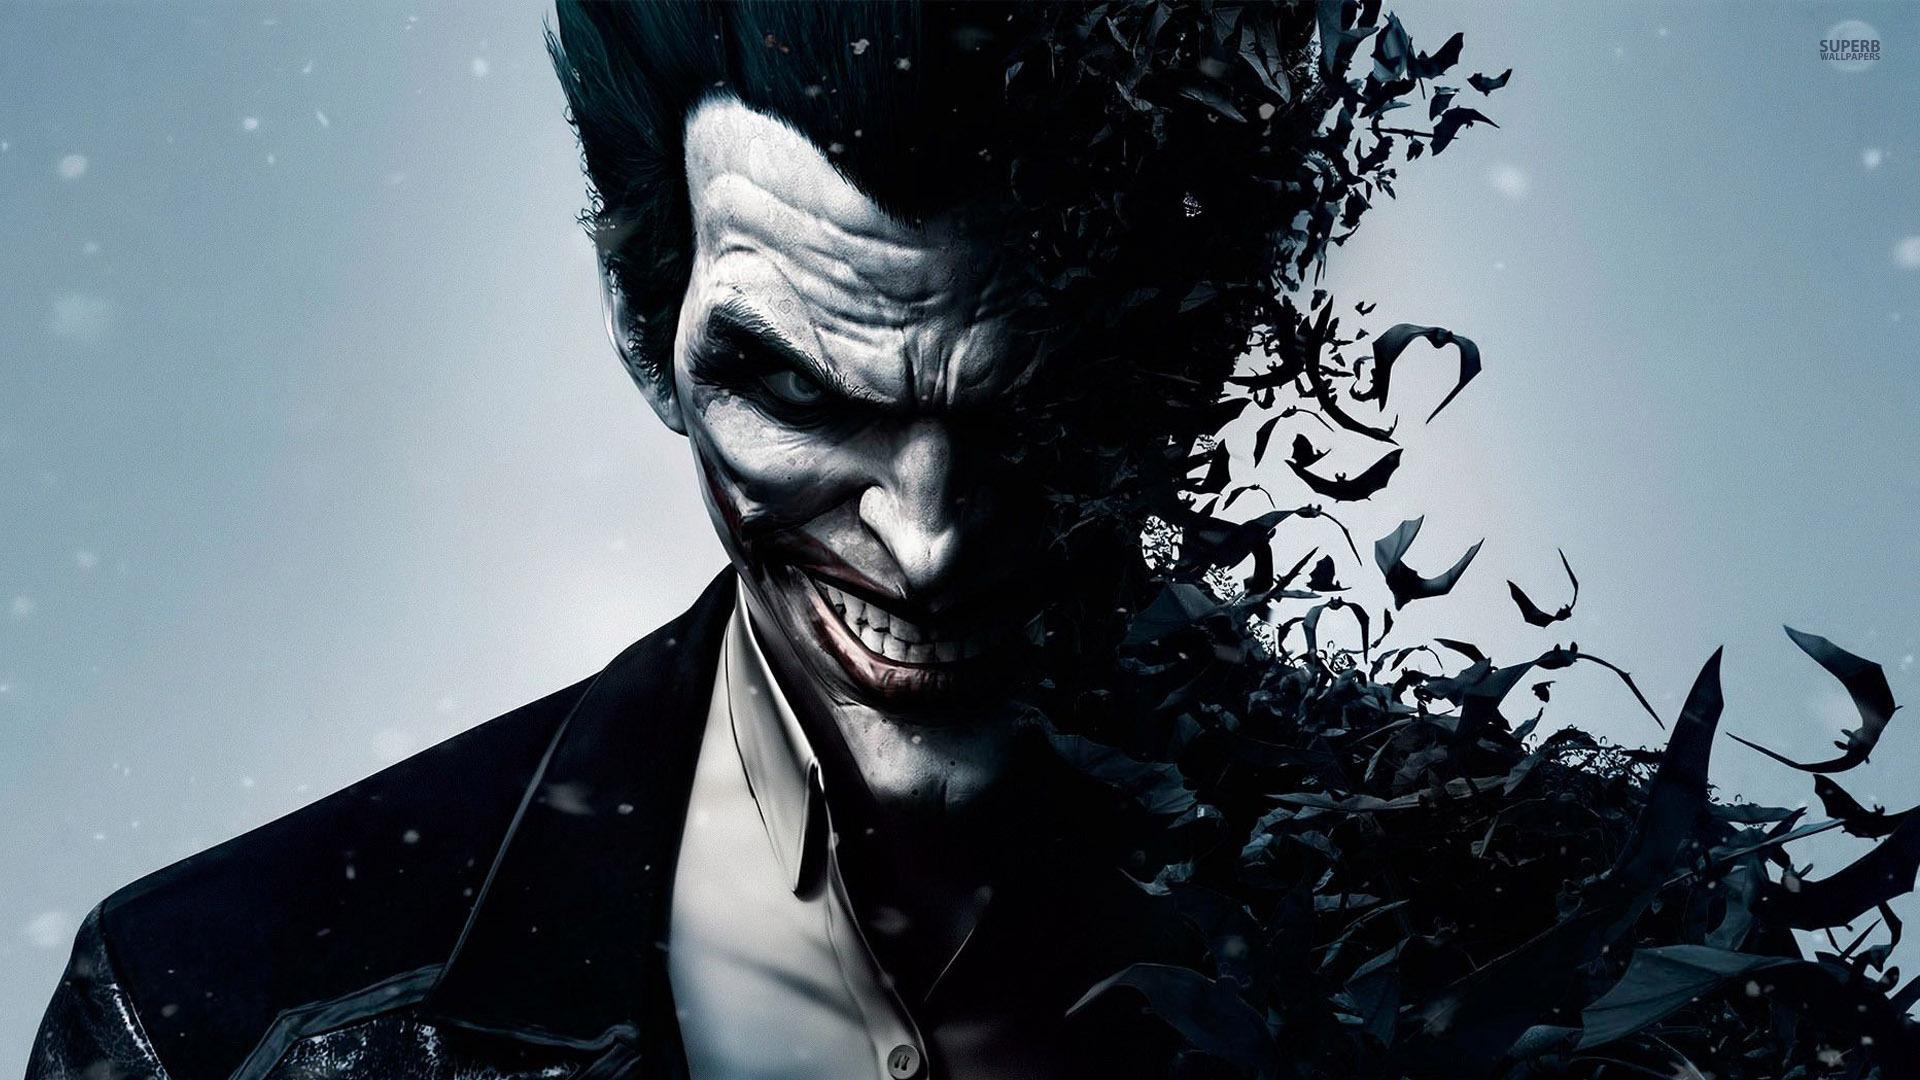 batman arkham origins | Joker Batman Arkham Origins Wallpaper - HD